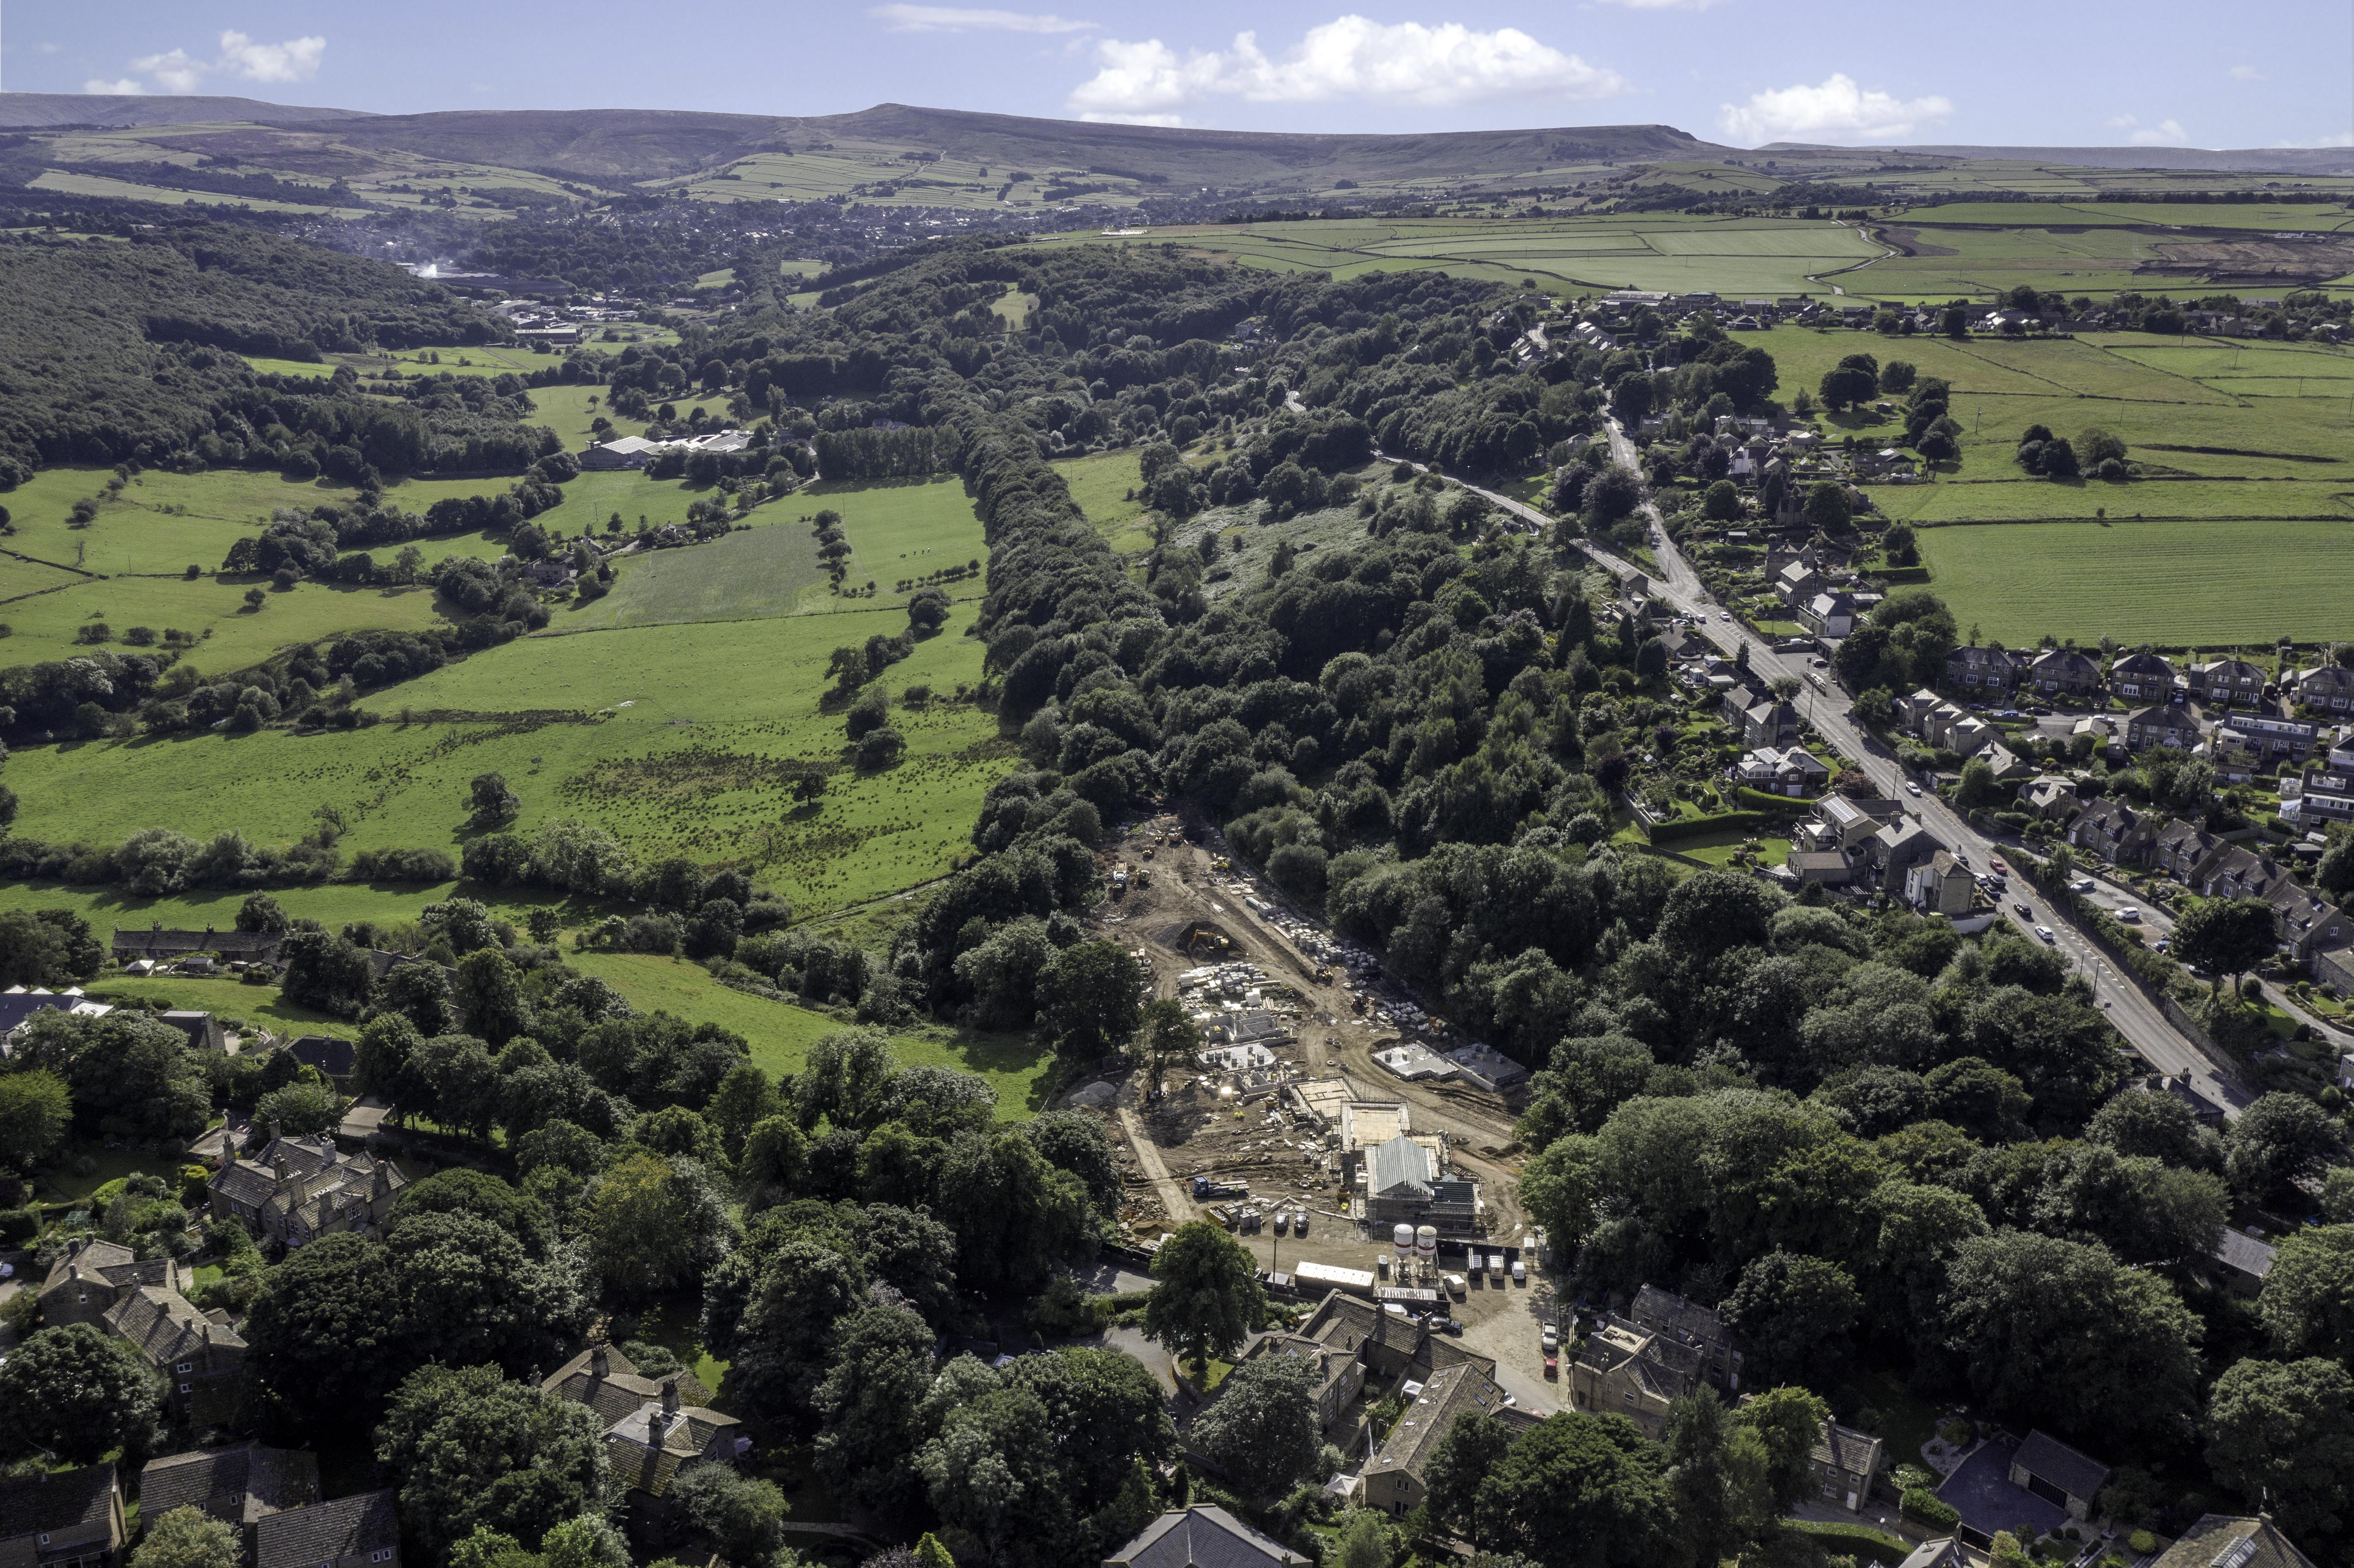 Fold Farm – A whistle-stop tour of the surrounding area